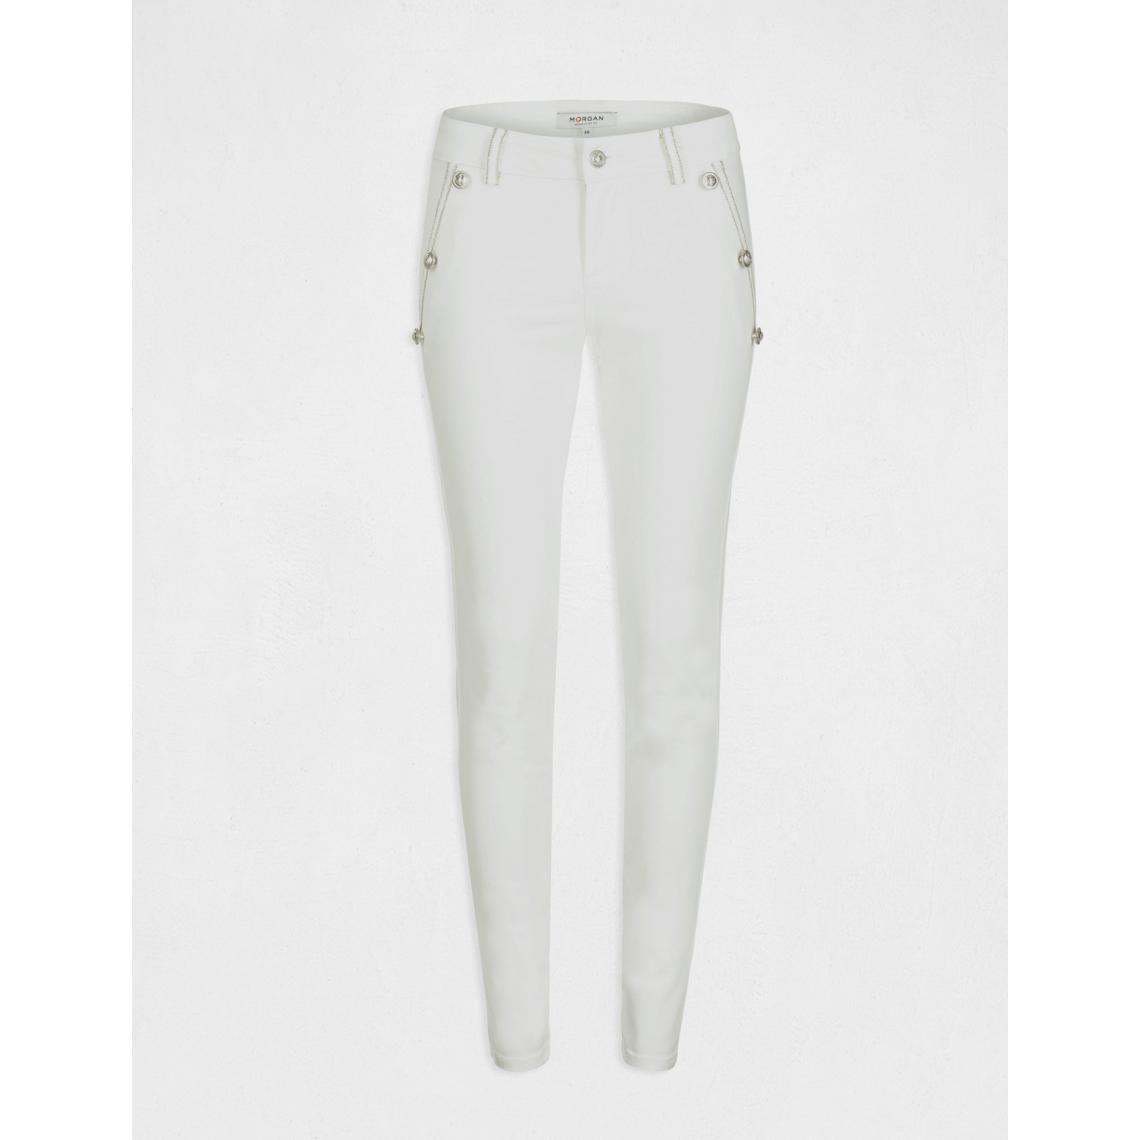 Pantalon slim taille basse à pont ALdkD